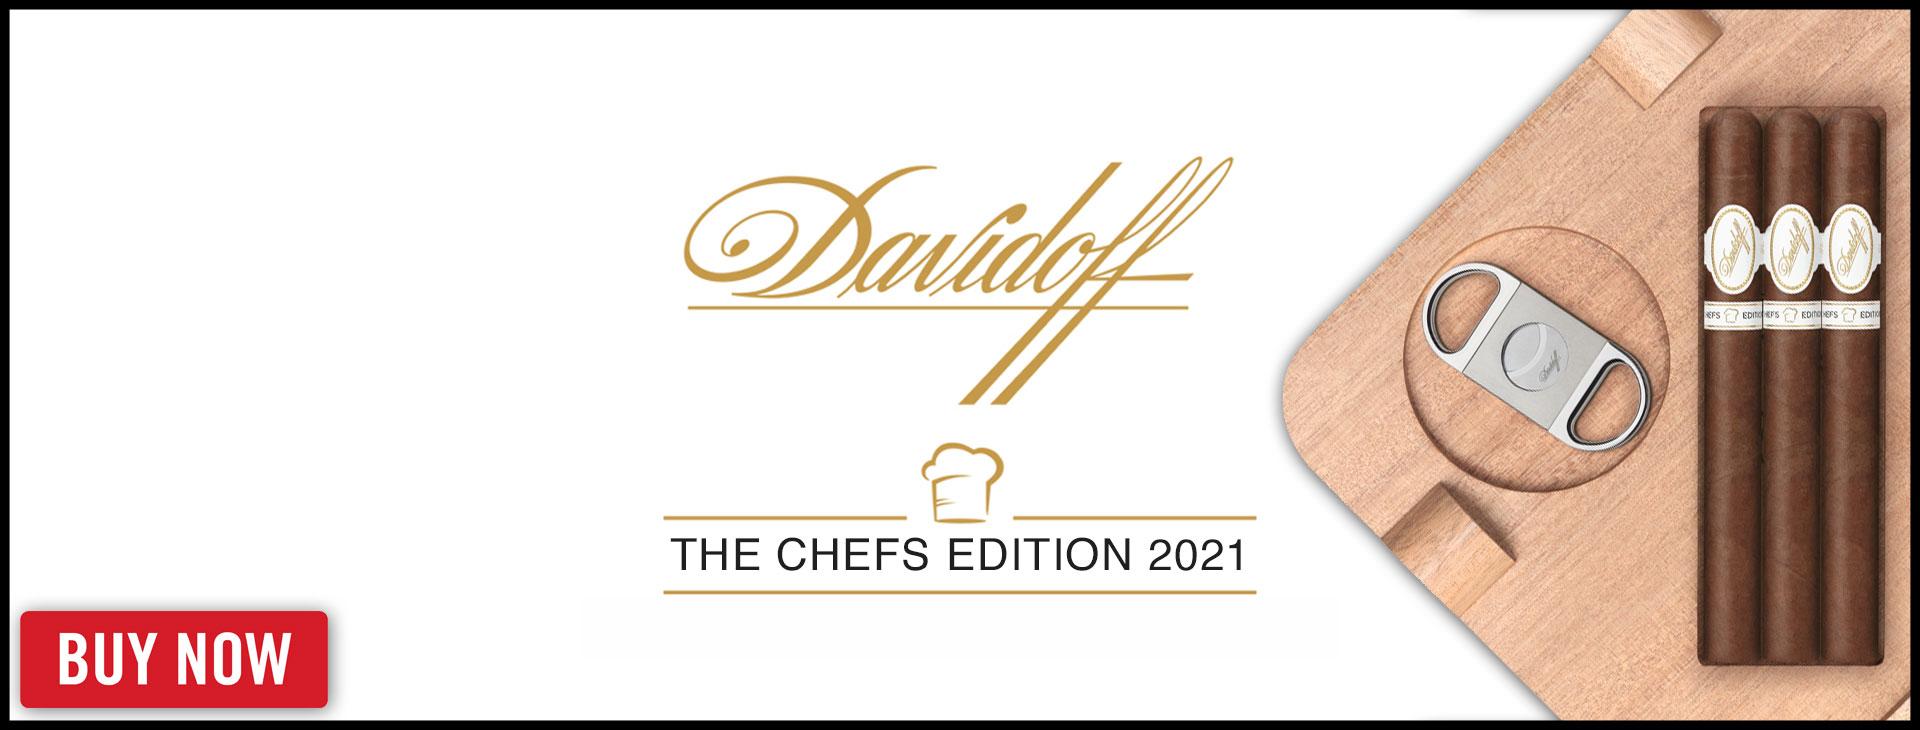 davidoff-chefs-edition-2021-banner.jpg